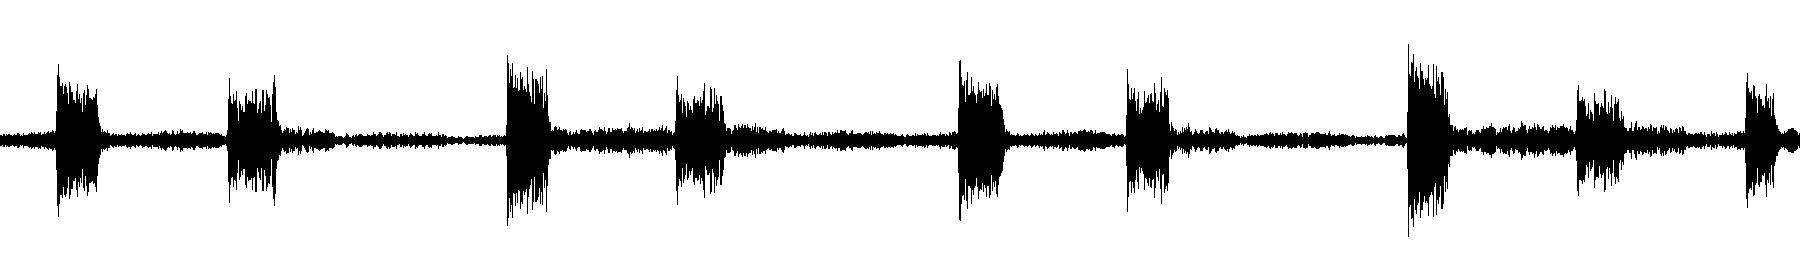 pth synth 16